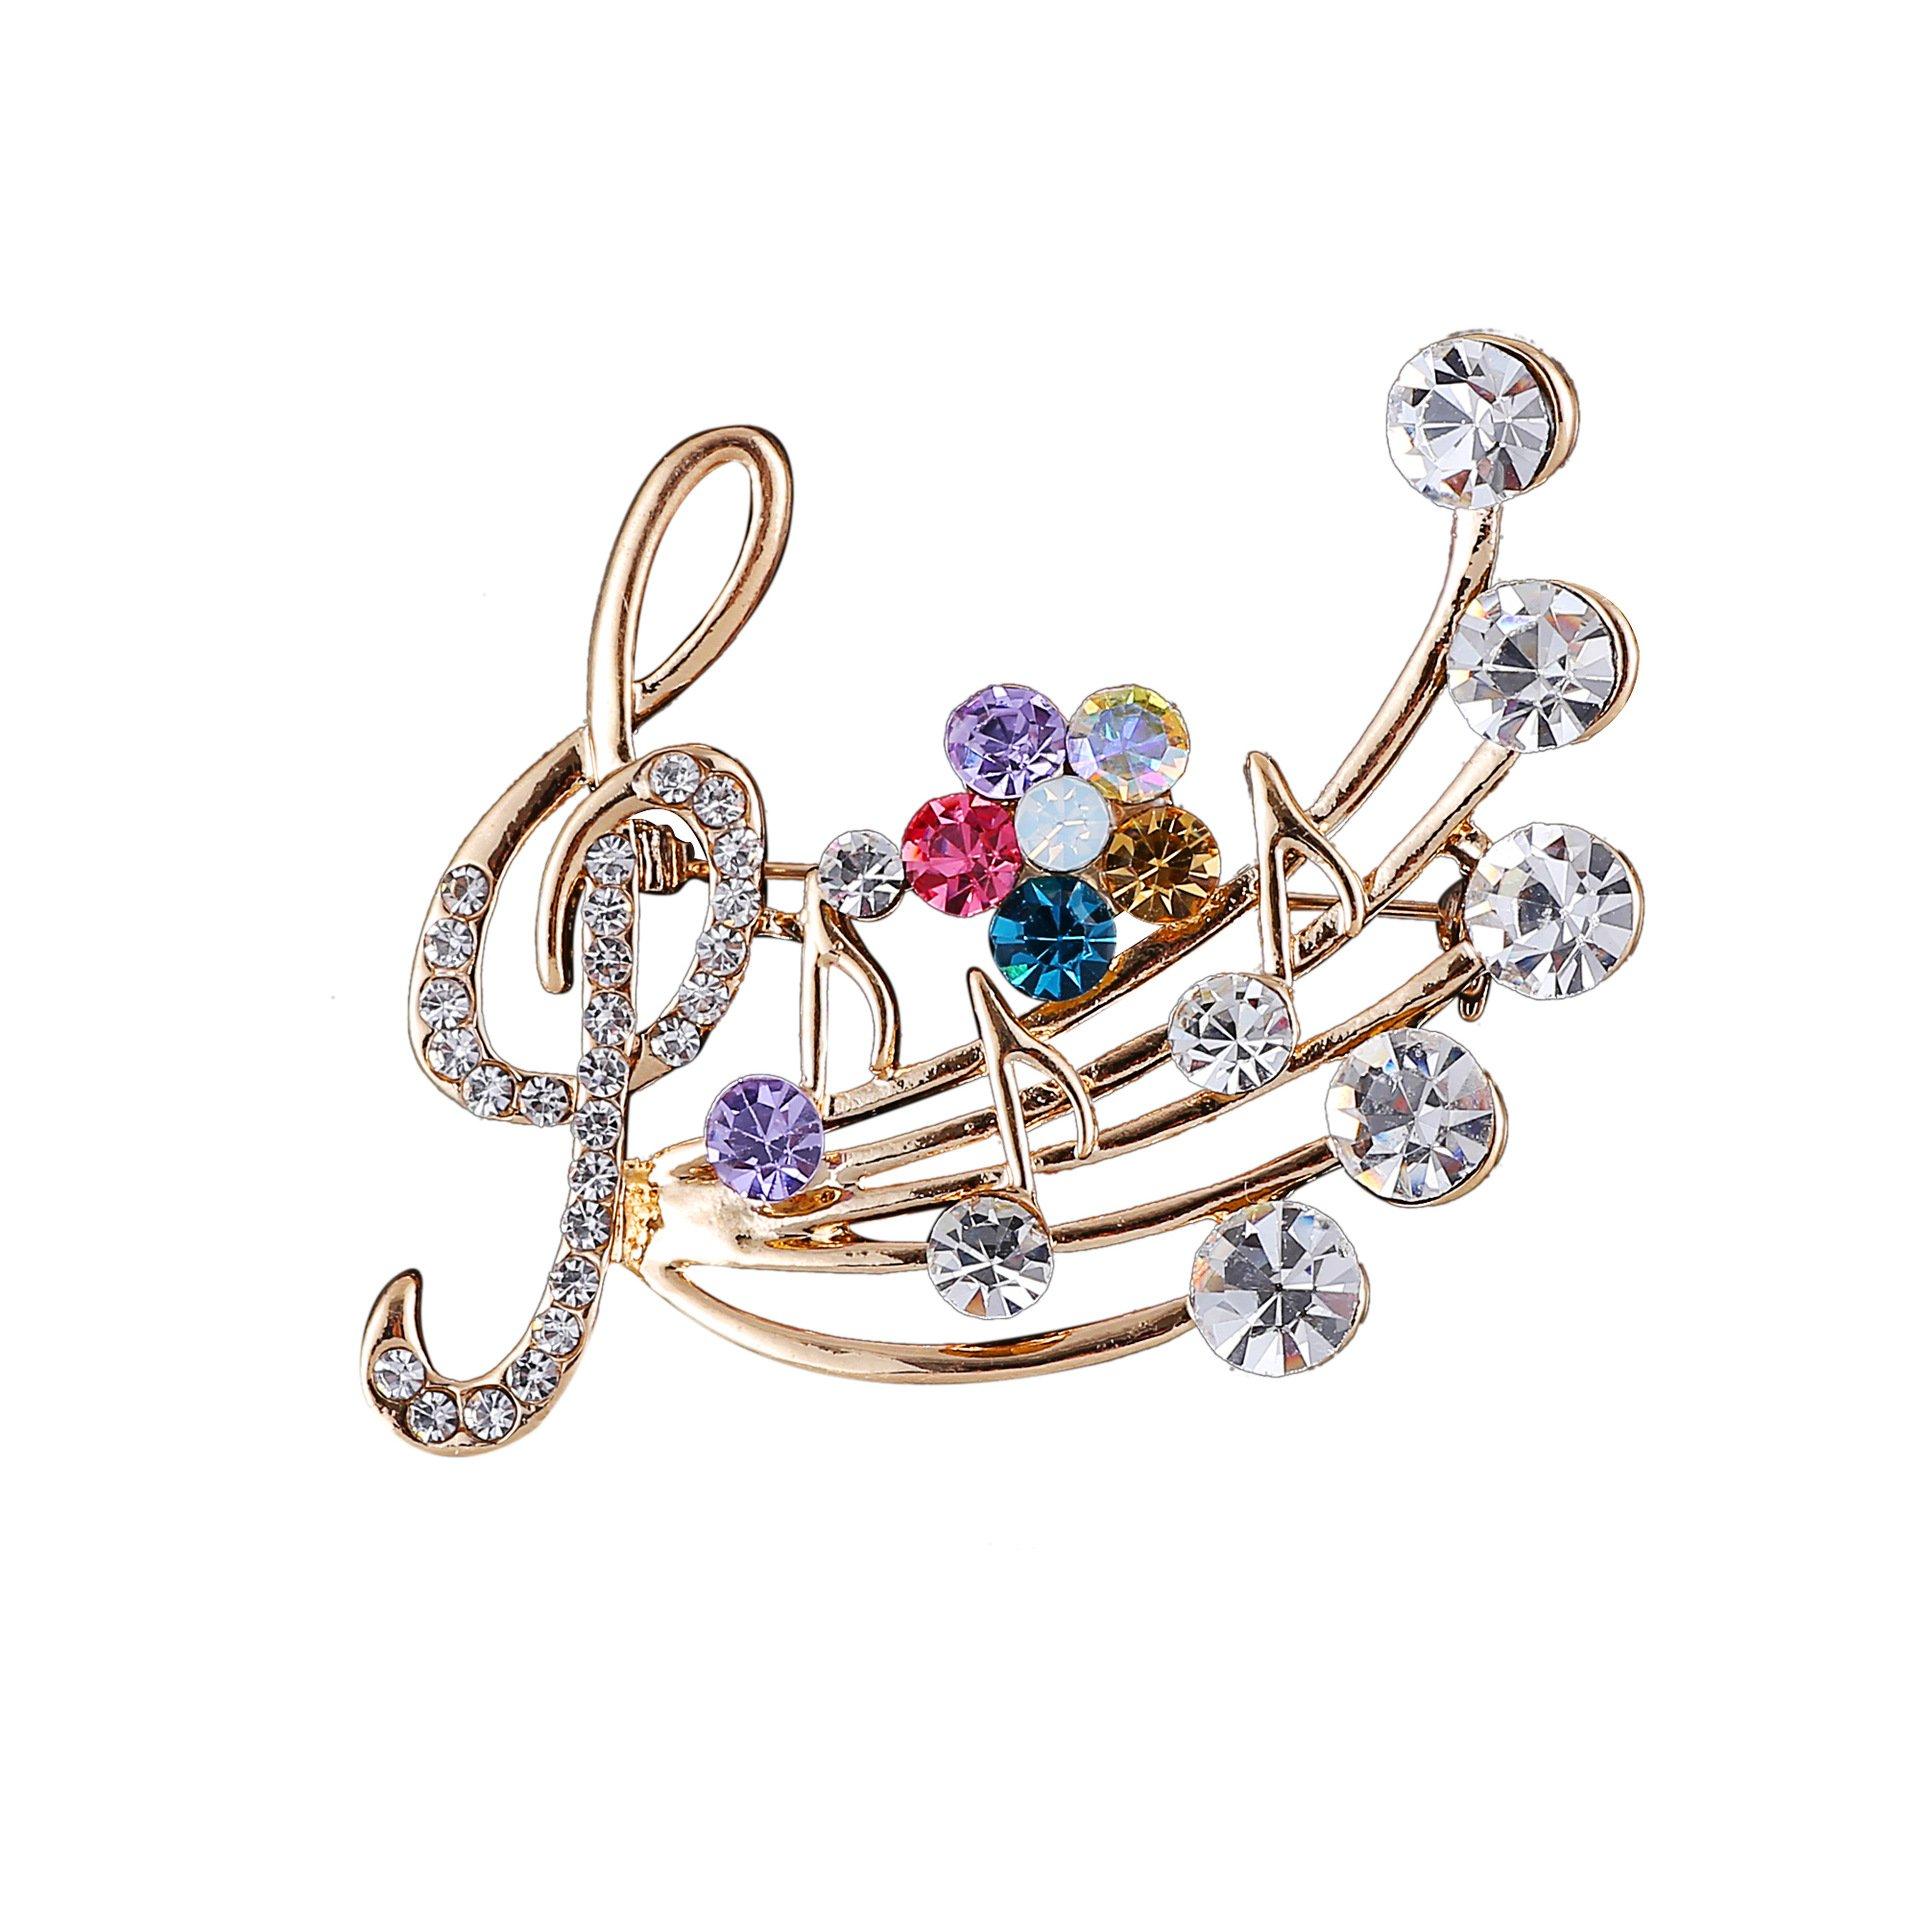 YinMai Treble Clef Musical Notes Brooch Pin Multicolor Rhinestone flower Brooch